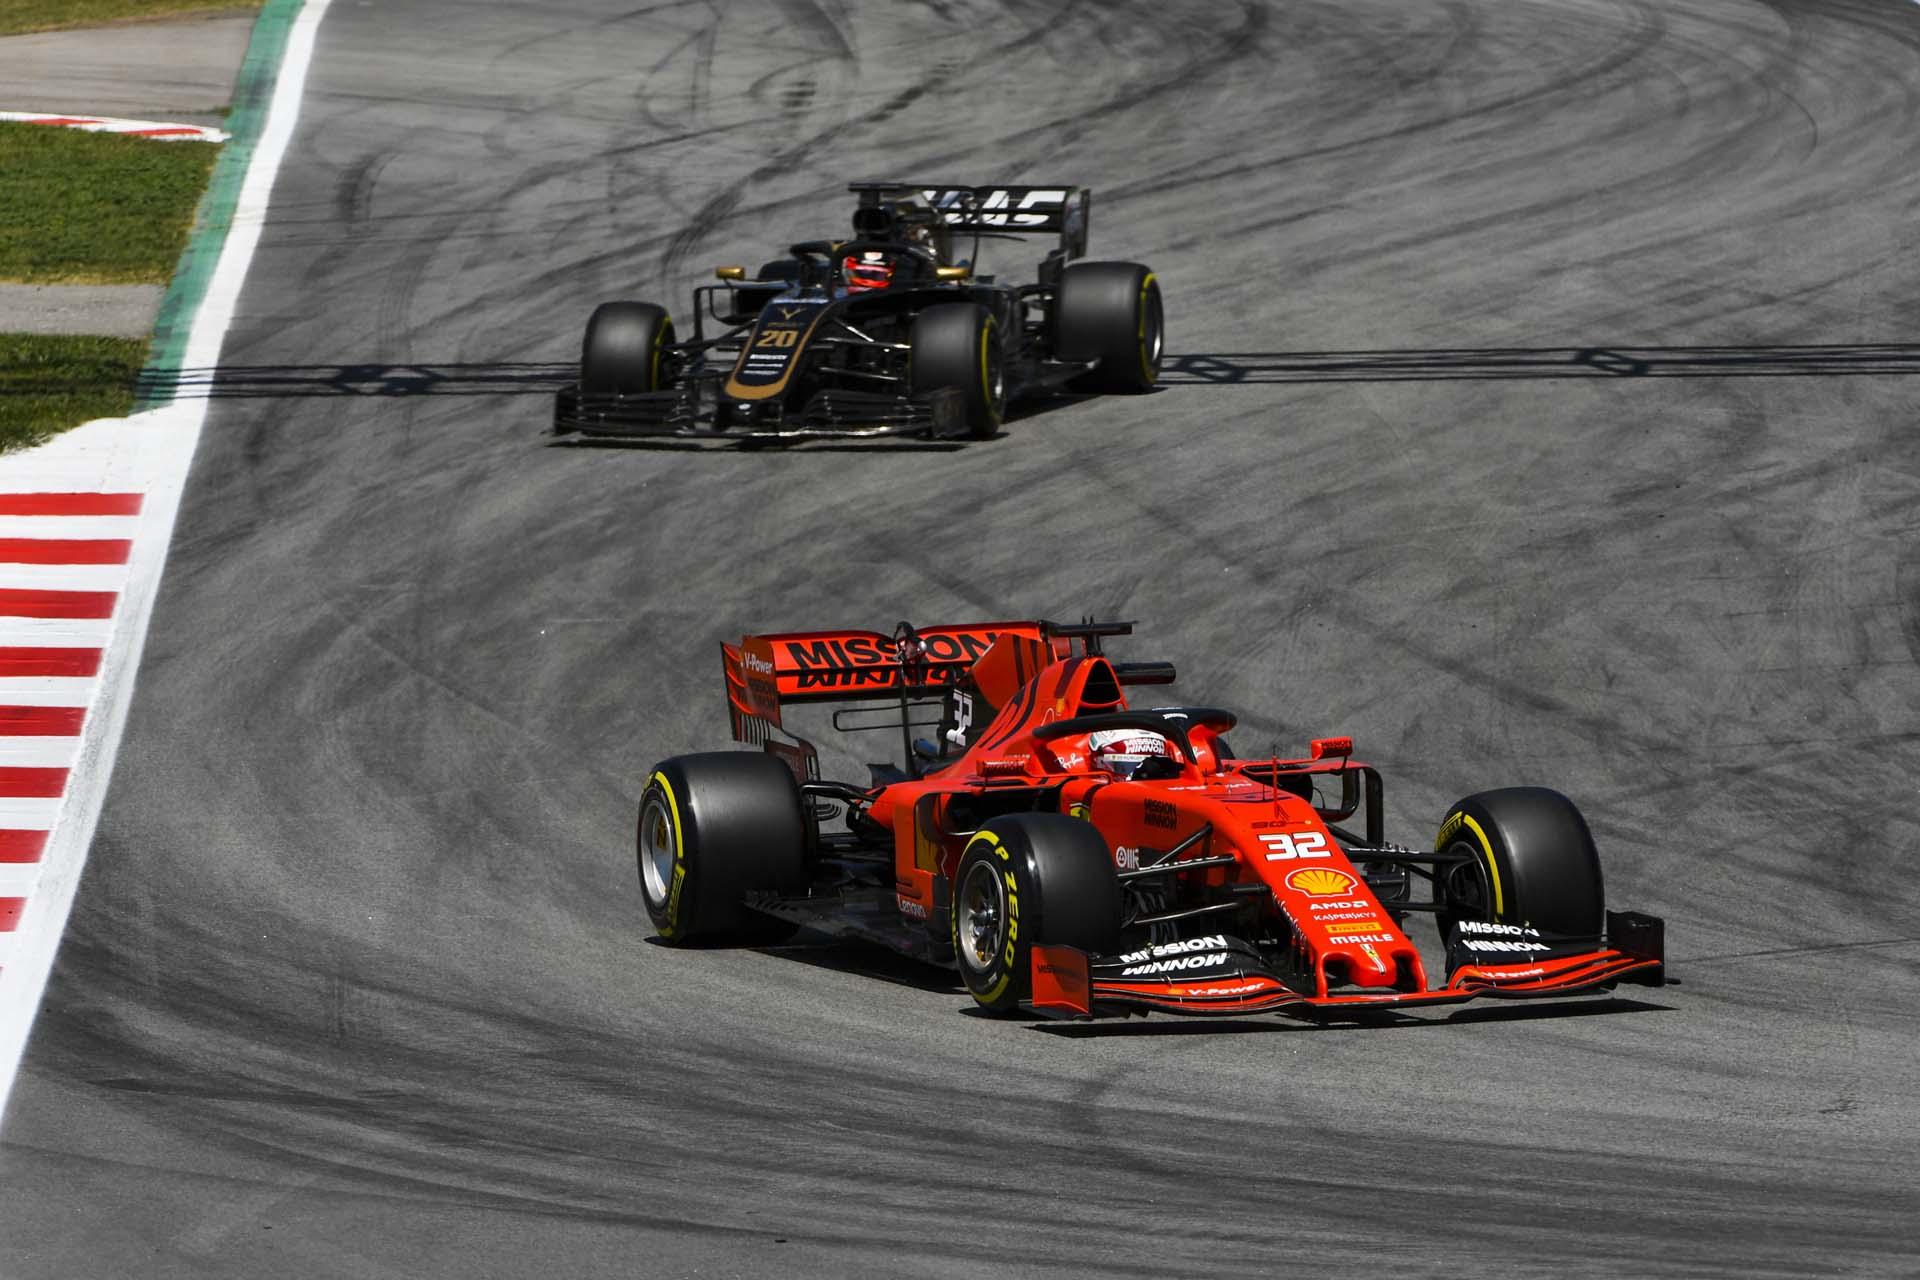 Antonio Fuoco, Ferrari SF90 and Kevin Magnussen, Haas VF-19